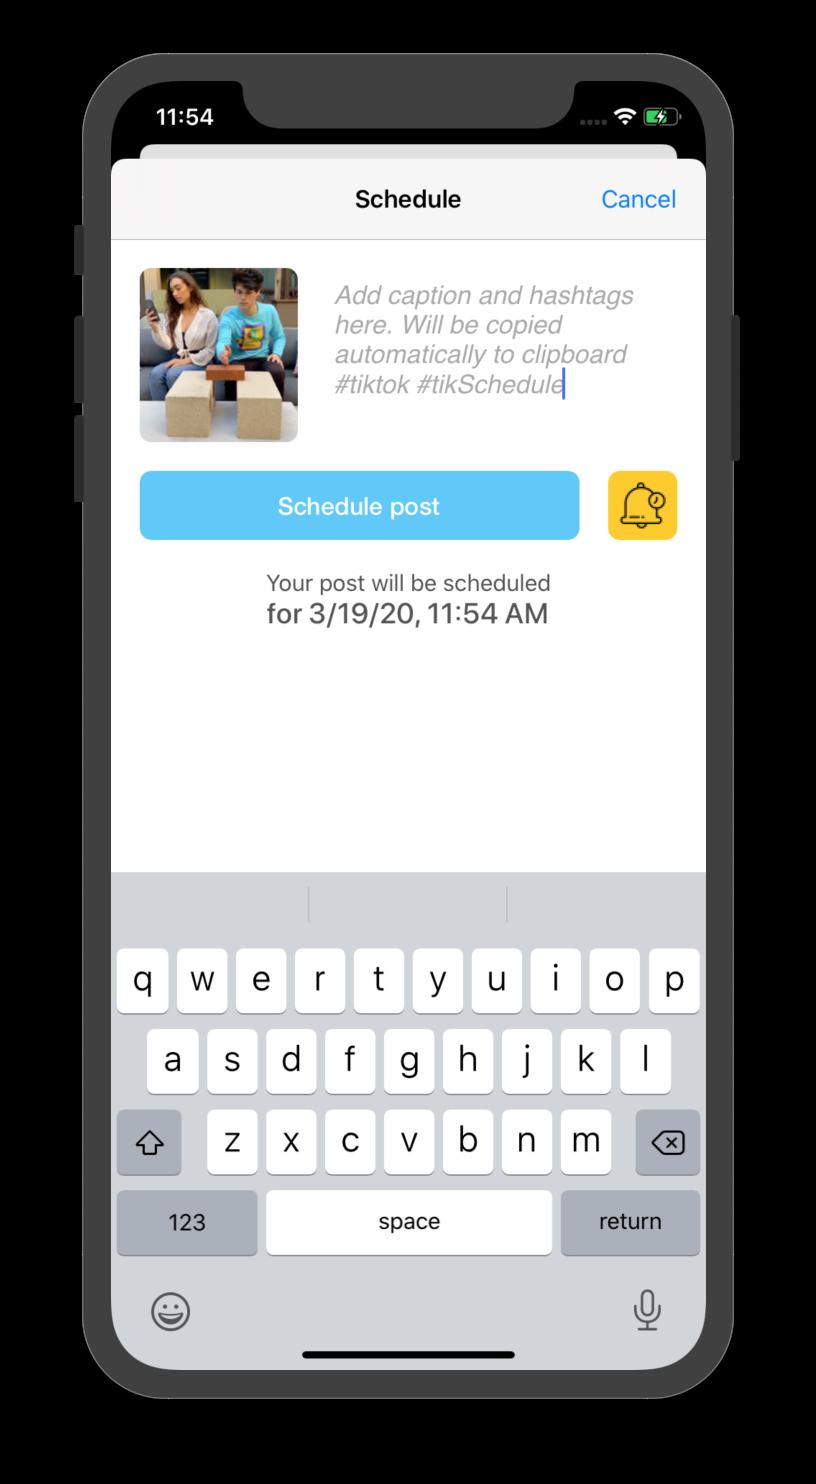 Get 6 Free Tiktok Video Ideas For Your Business Video In 2020 Social Media Social Media Tool Marketing Method